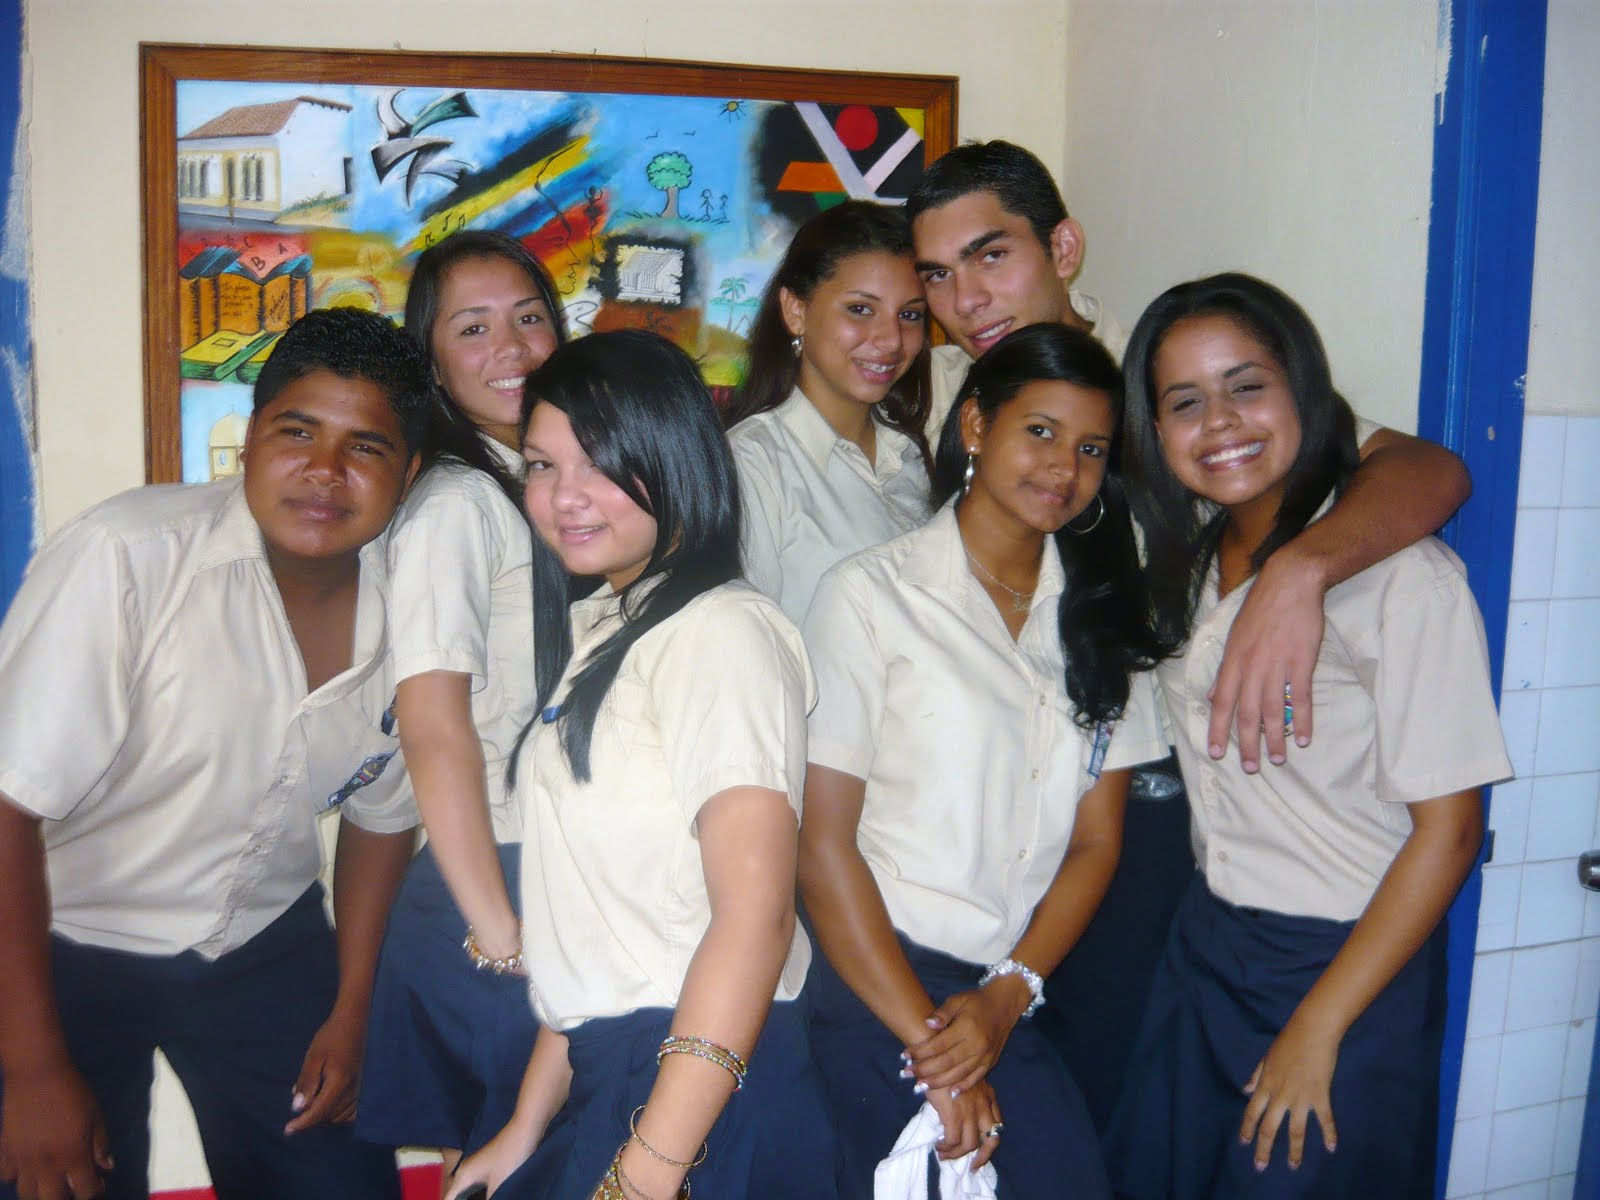 liceo bolivariano manuel vicente romero garcia: